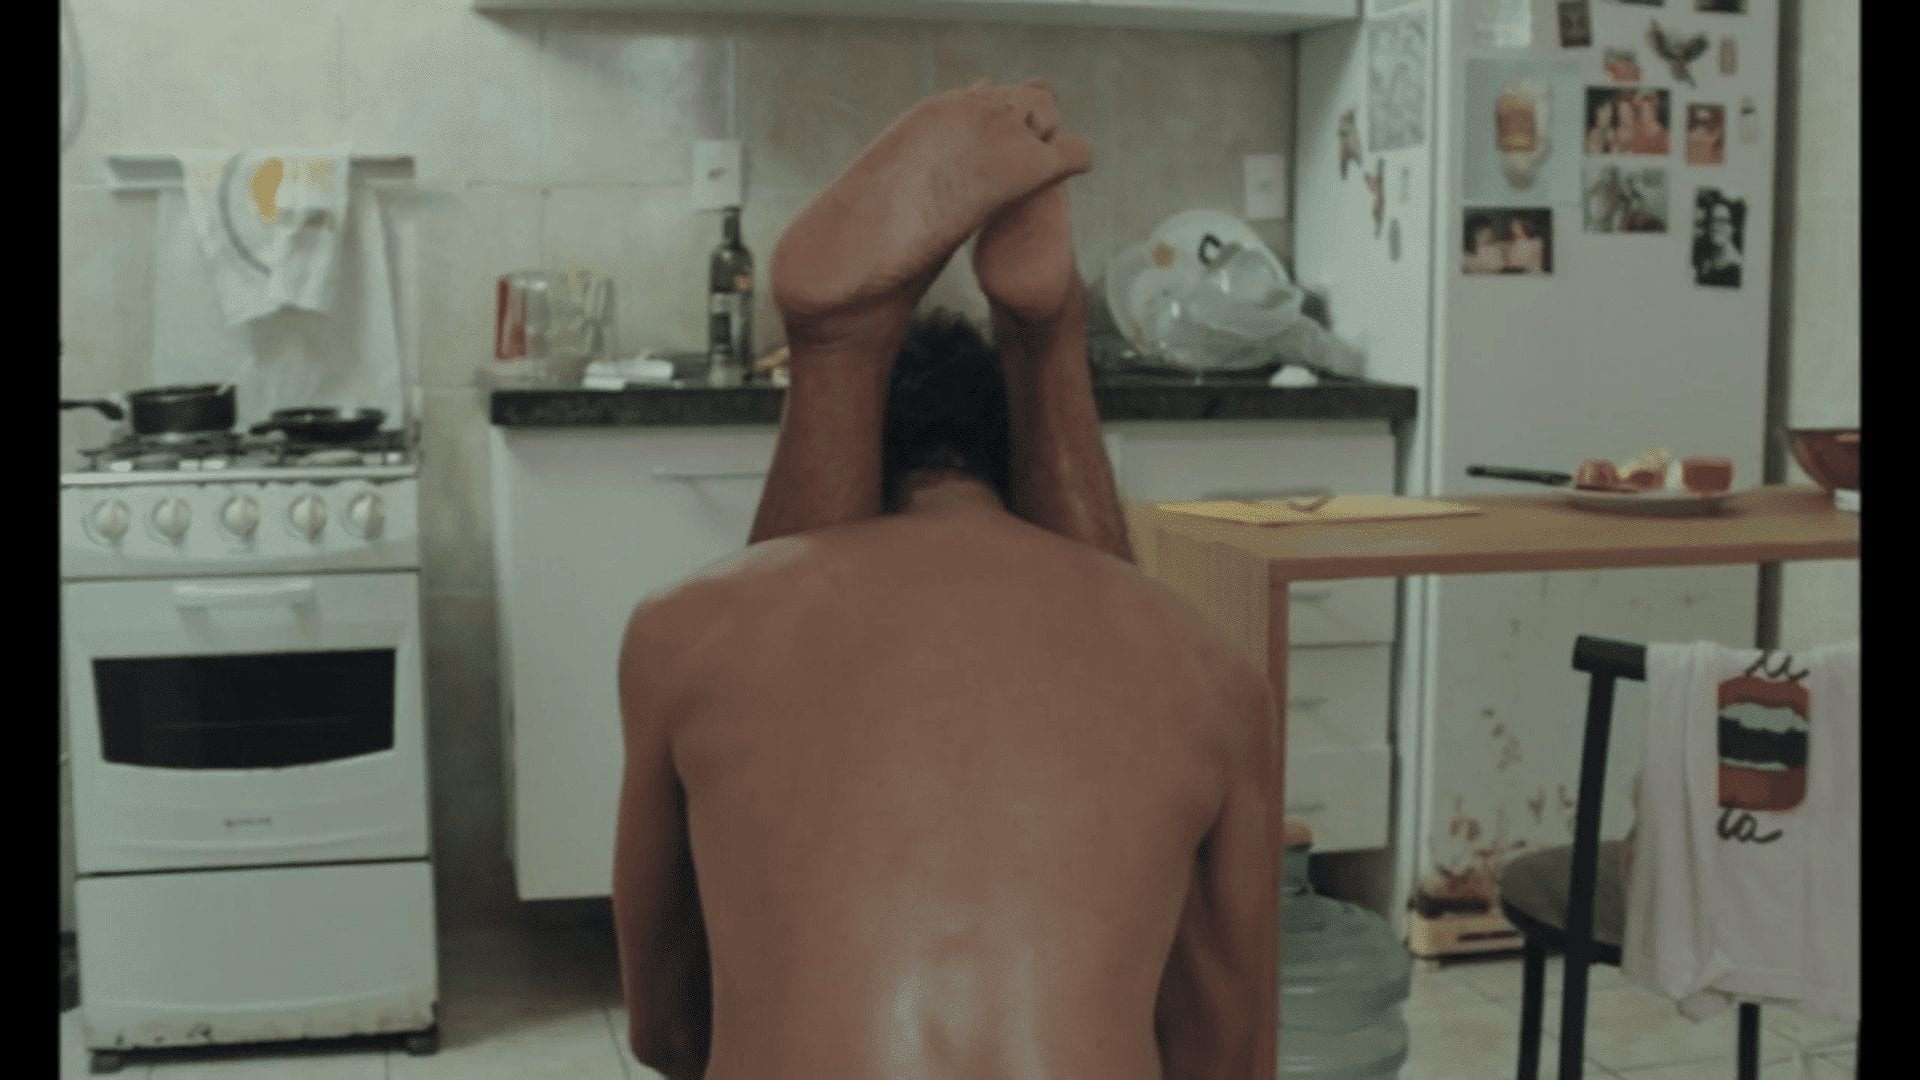 Film still from Daytime Doorman, a gay themed movie from Brazil